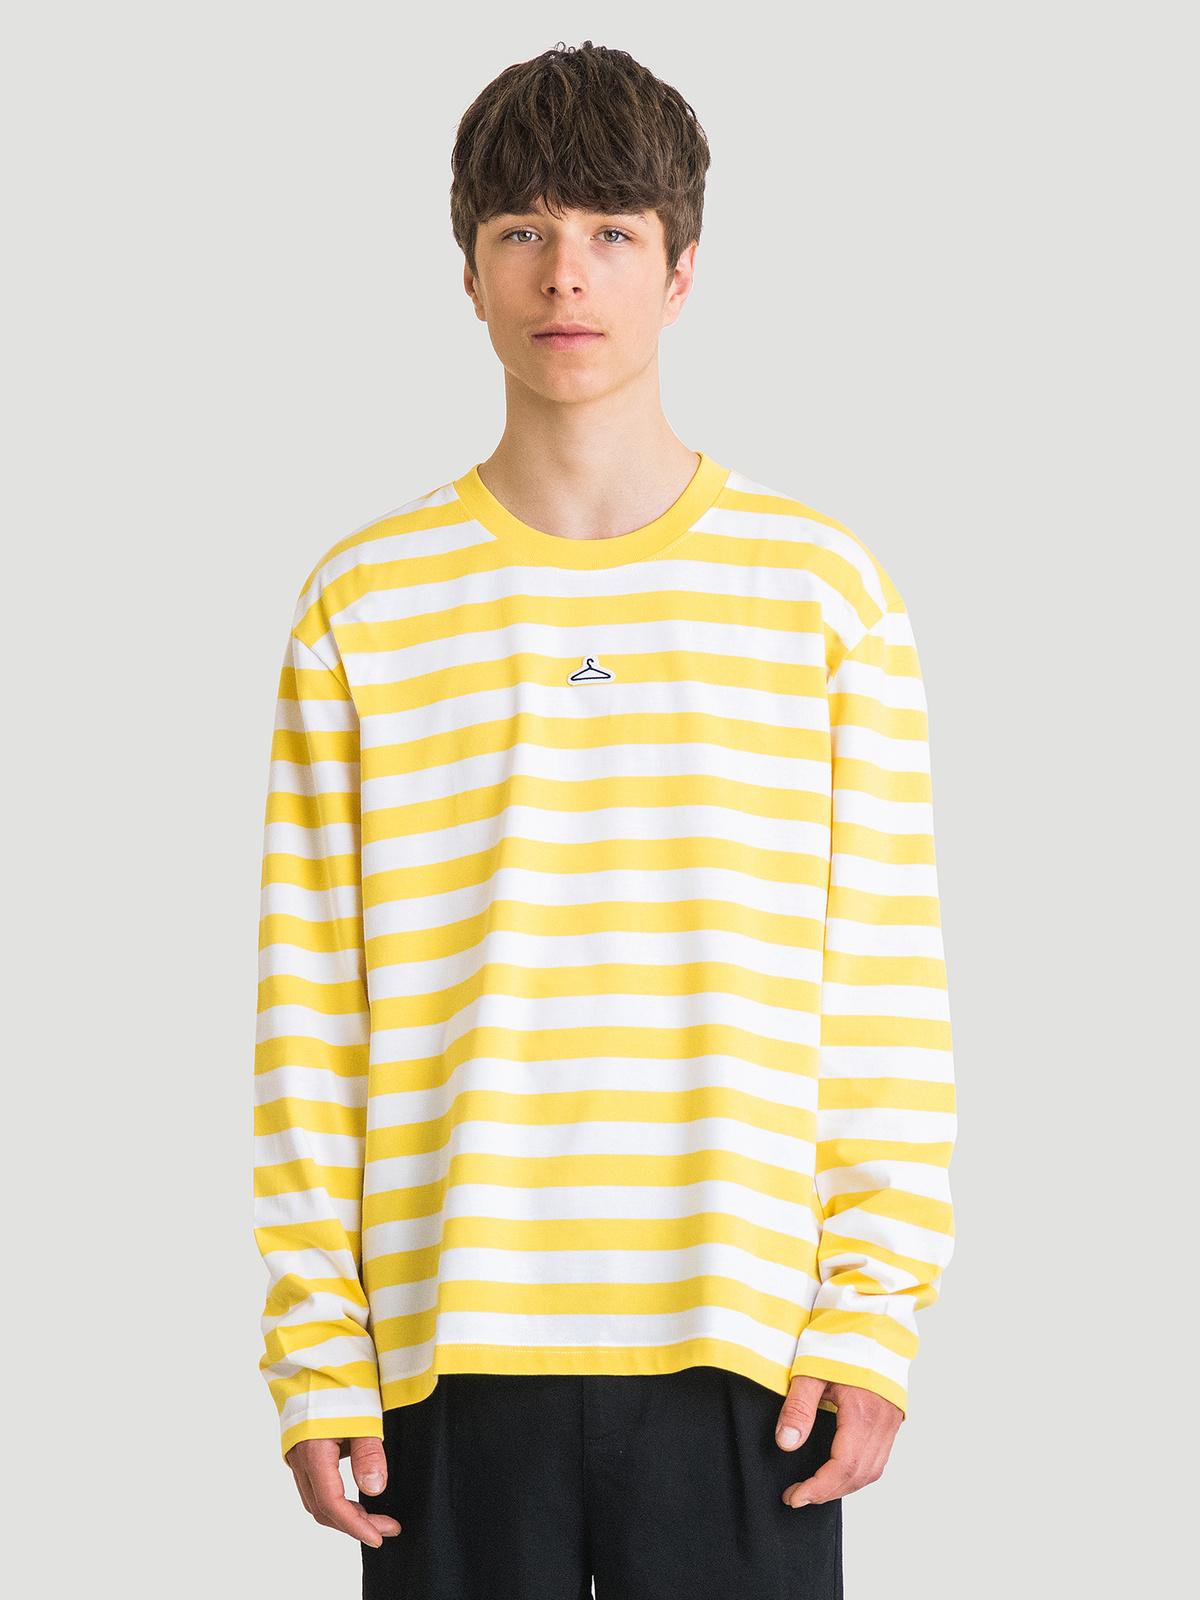 Hanger Striped Longsleeve Yellow White 0